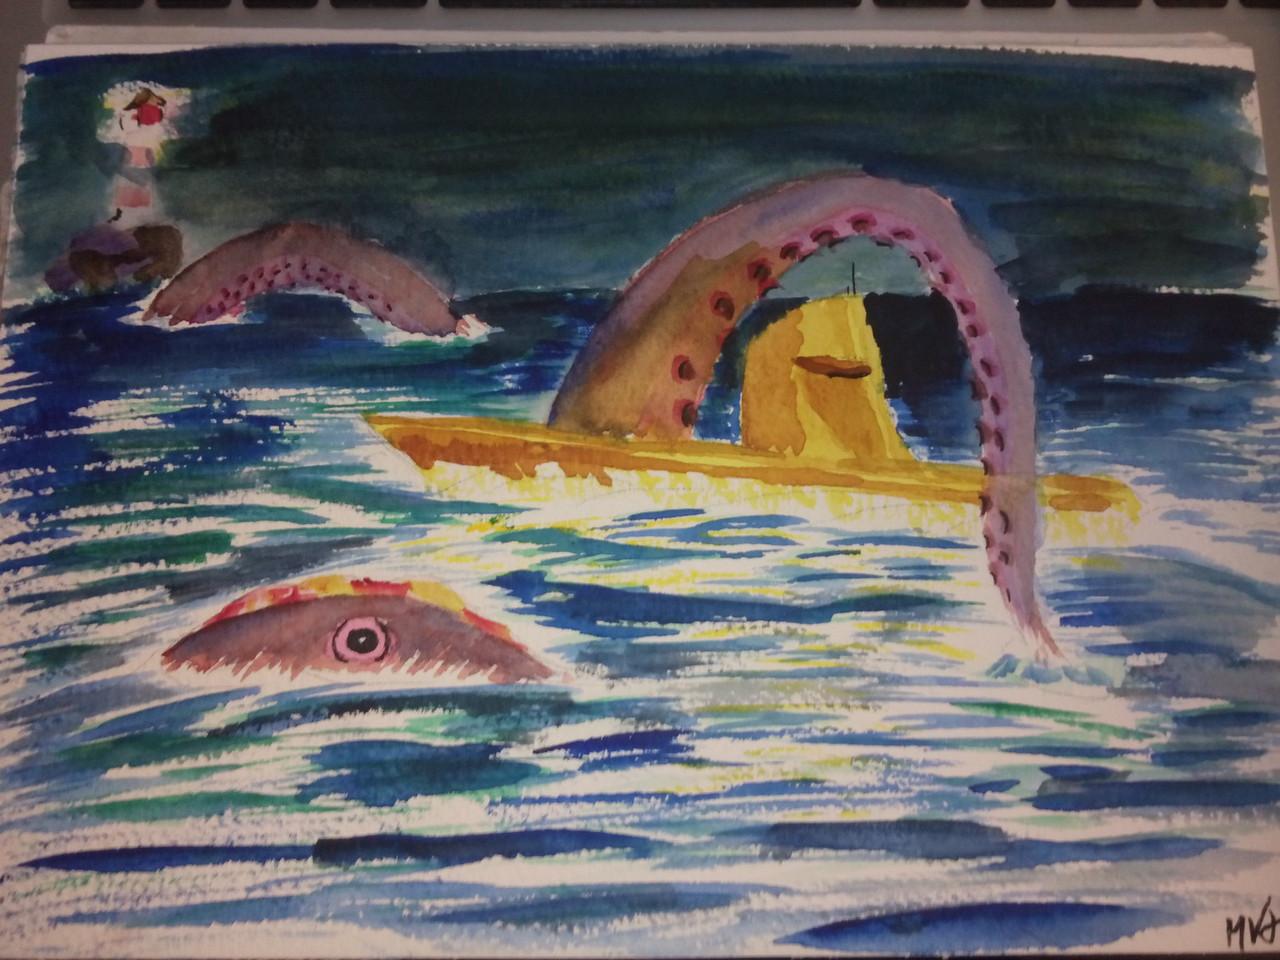 Leif Erickson and the Leviathan